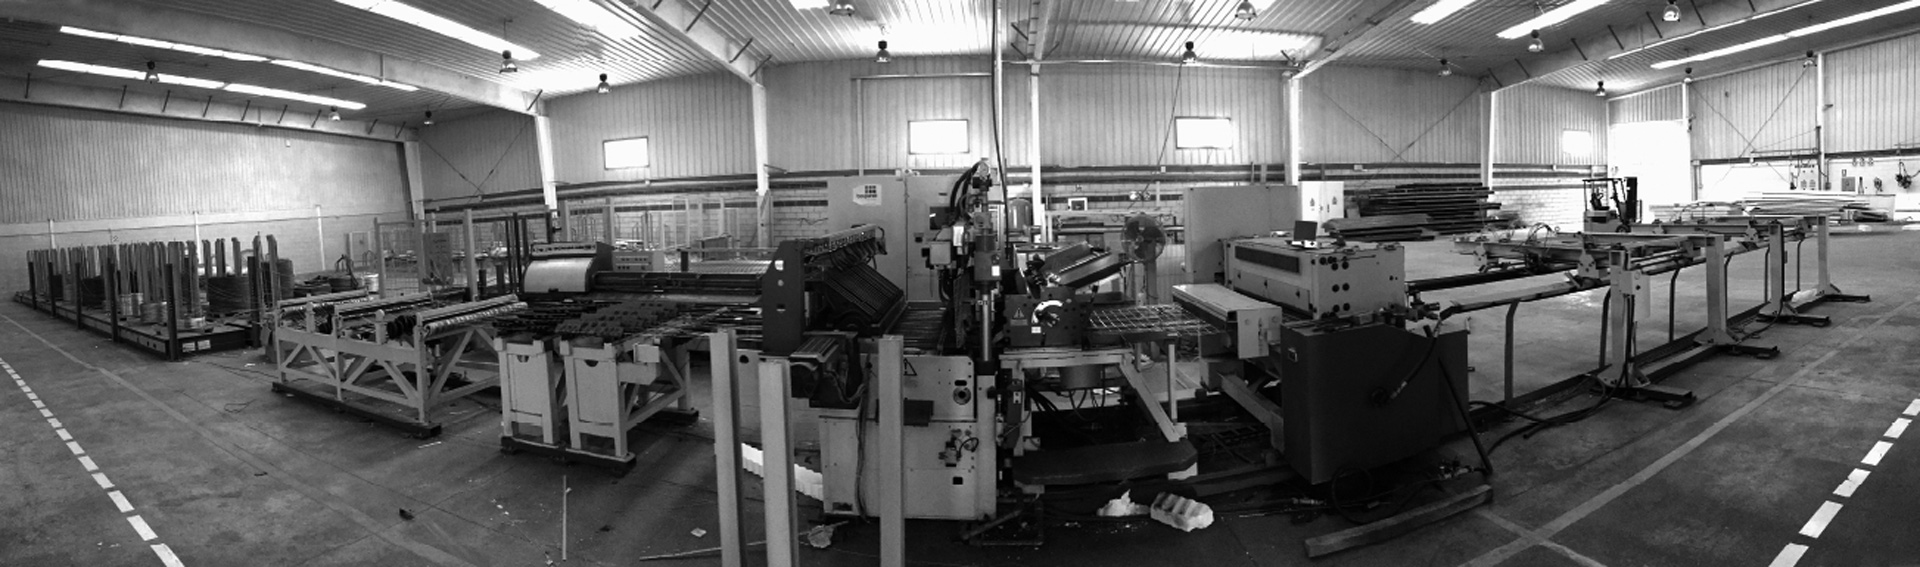 Machinerie Baupanel System